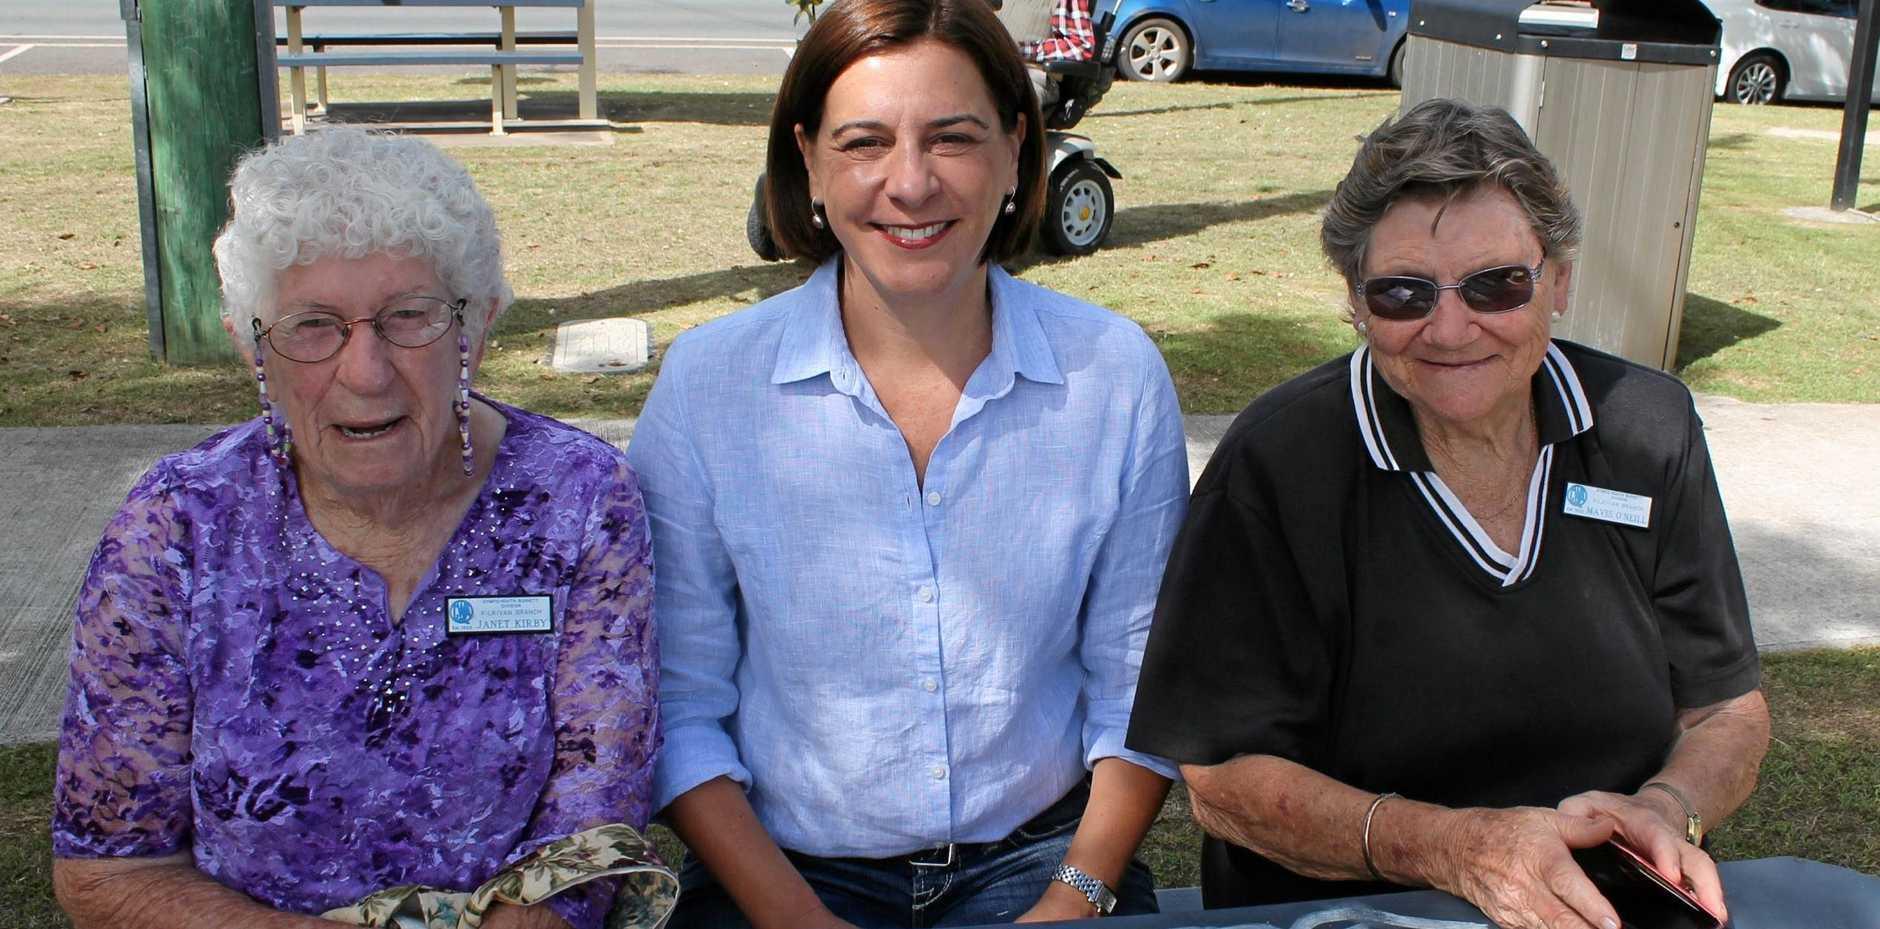 Nanango MP Deb Frecklington said Kilkivan will get a community nurse thanks to  Mavis O'Neill, Jan Kirby (pictured) and Joyce Koy.